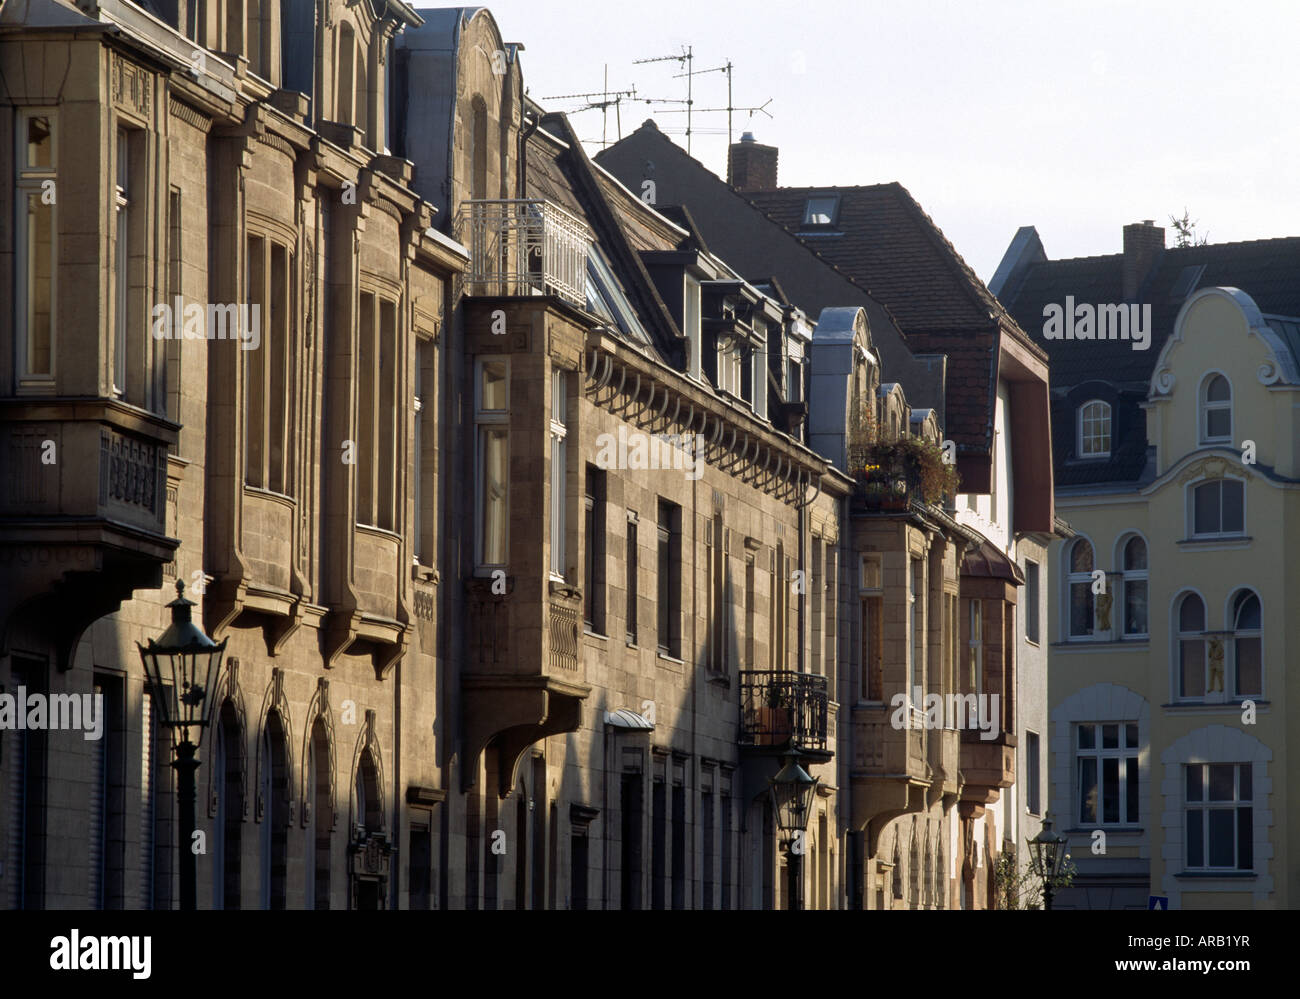 Häuserfassaden Modern düsseldorf oberkassel häuserfassade stock photo royalty free